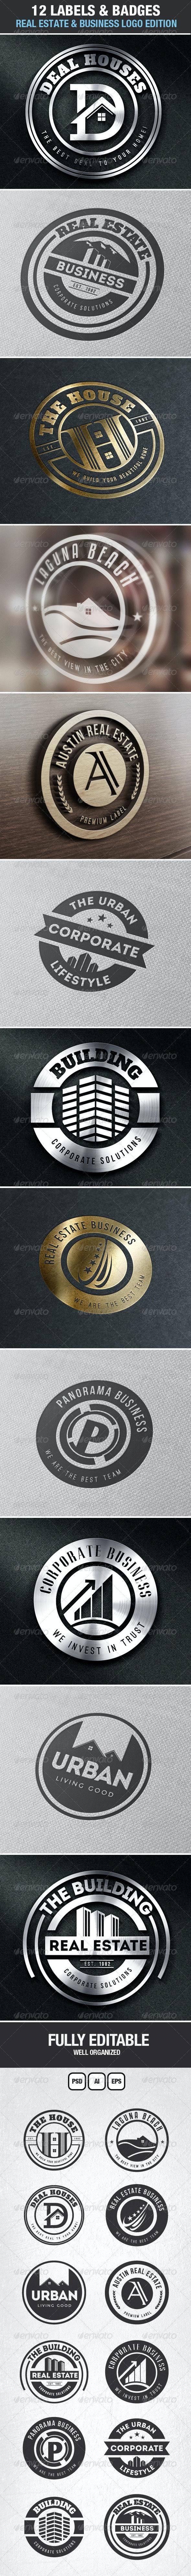 12 Real Estate & Business Labels & Badges Logos - Badges & Stickers Web Elements